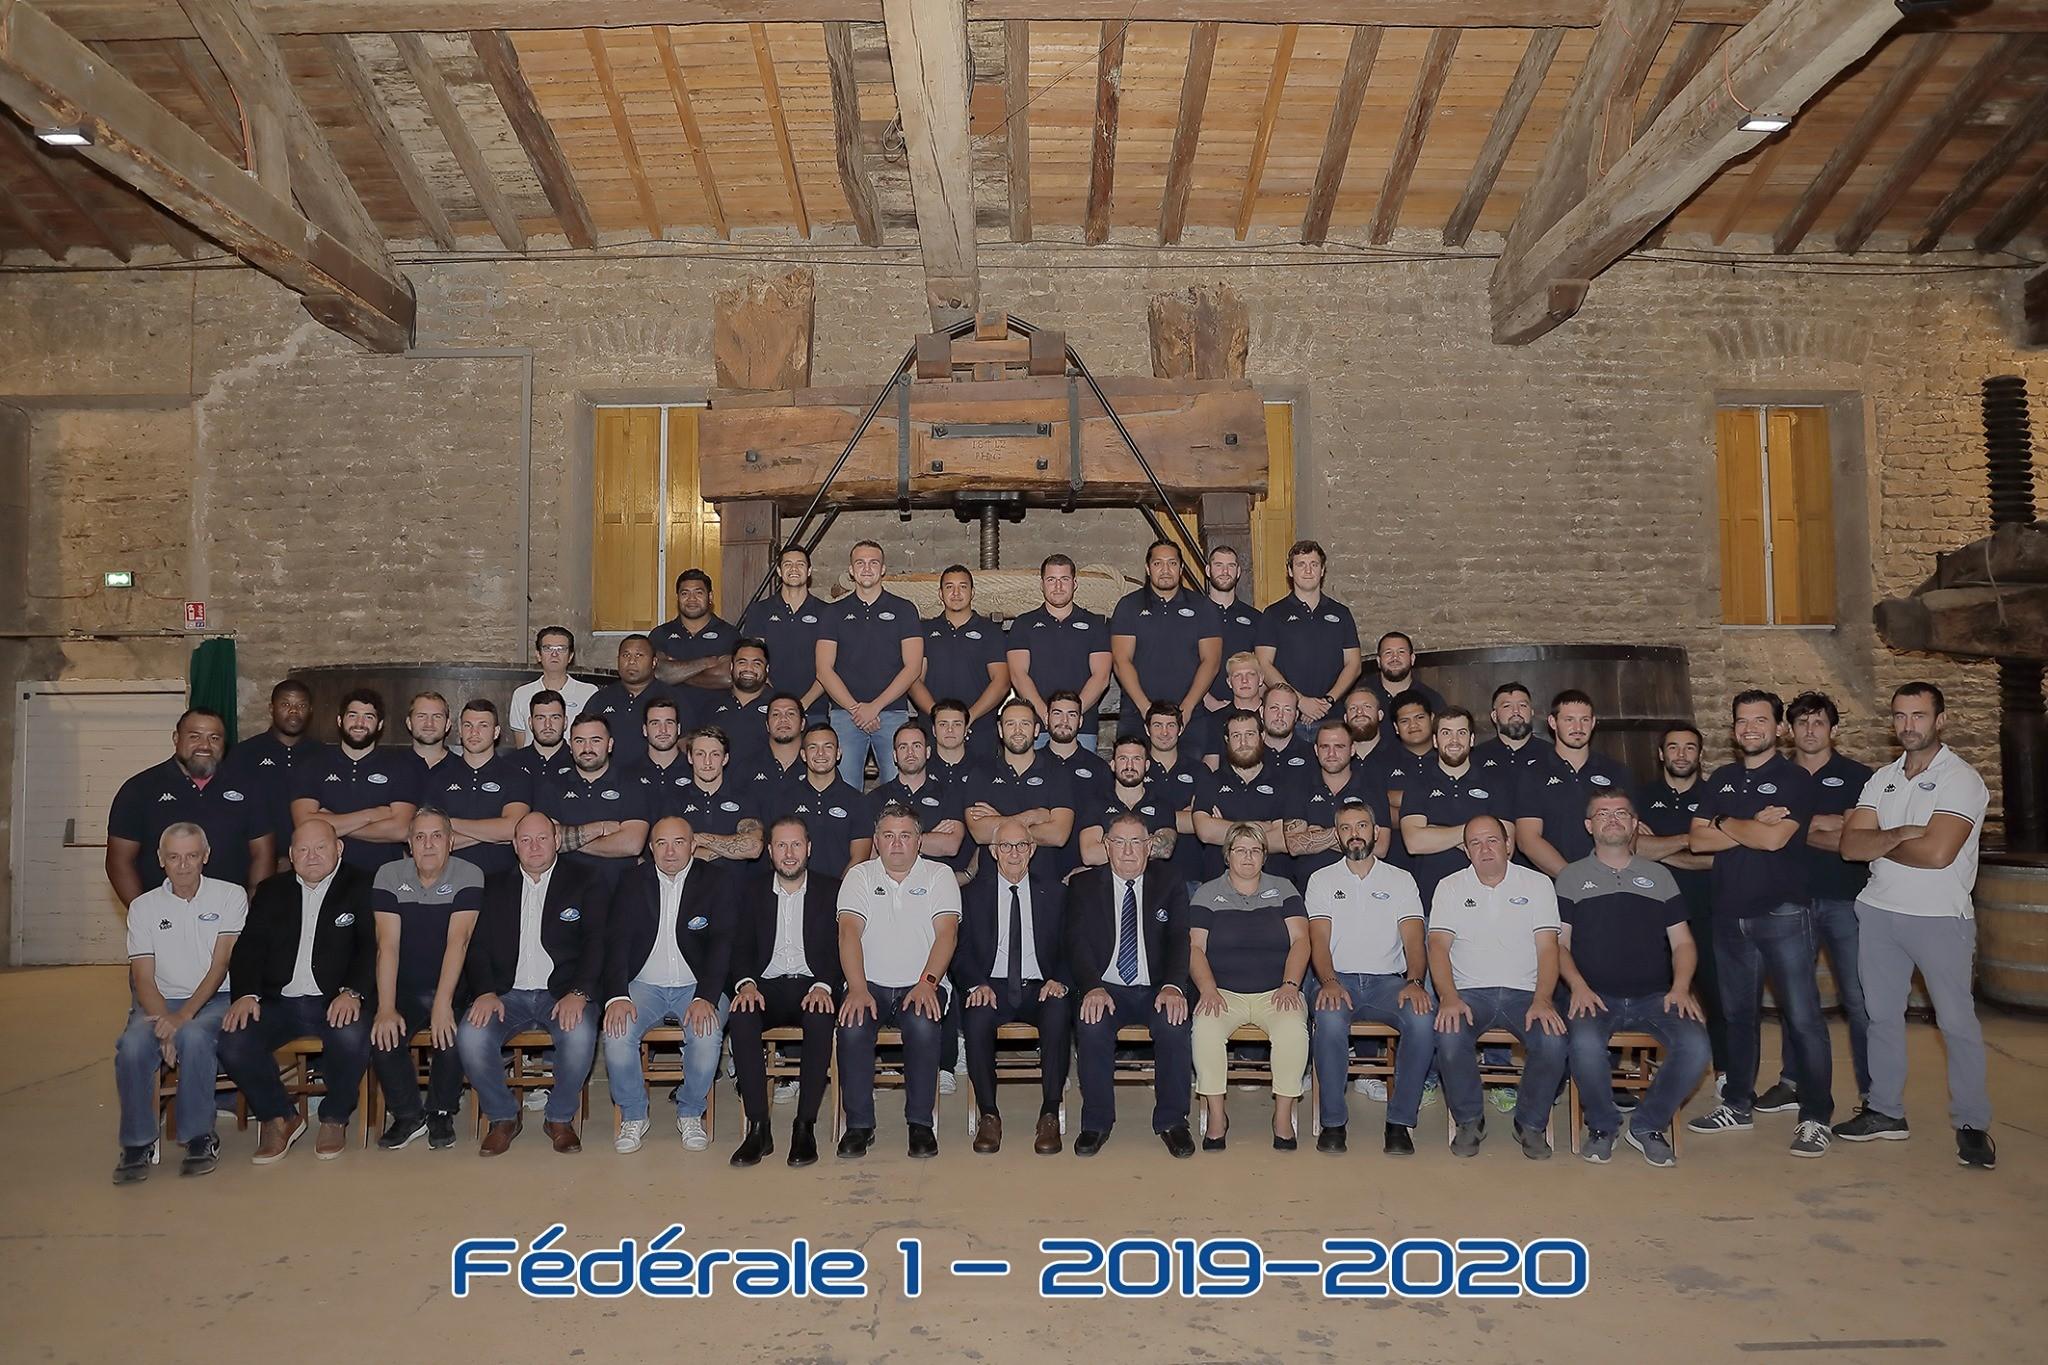 CSV Rugby-Fedearal1-2019-2020